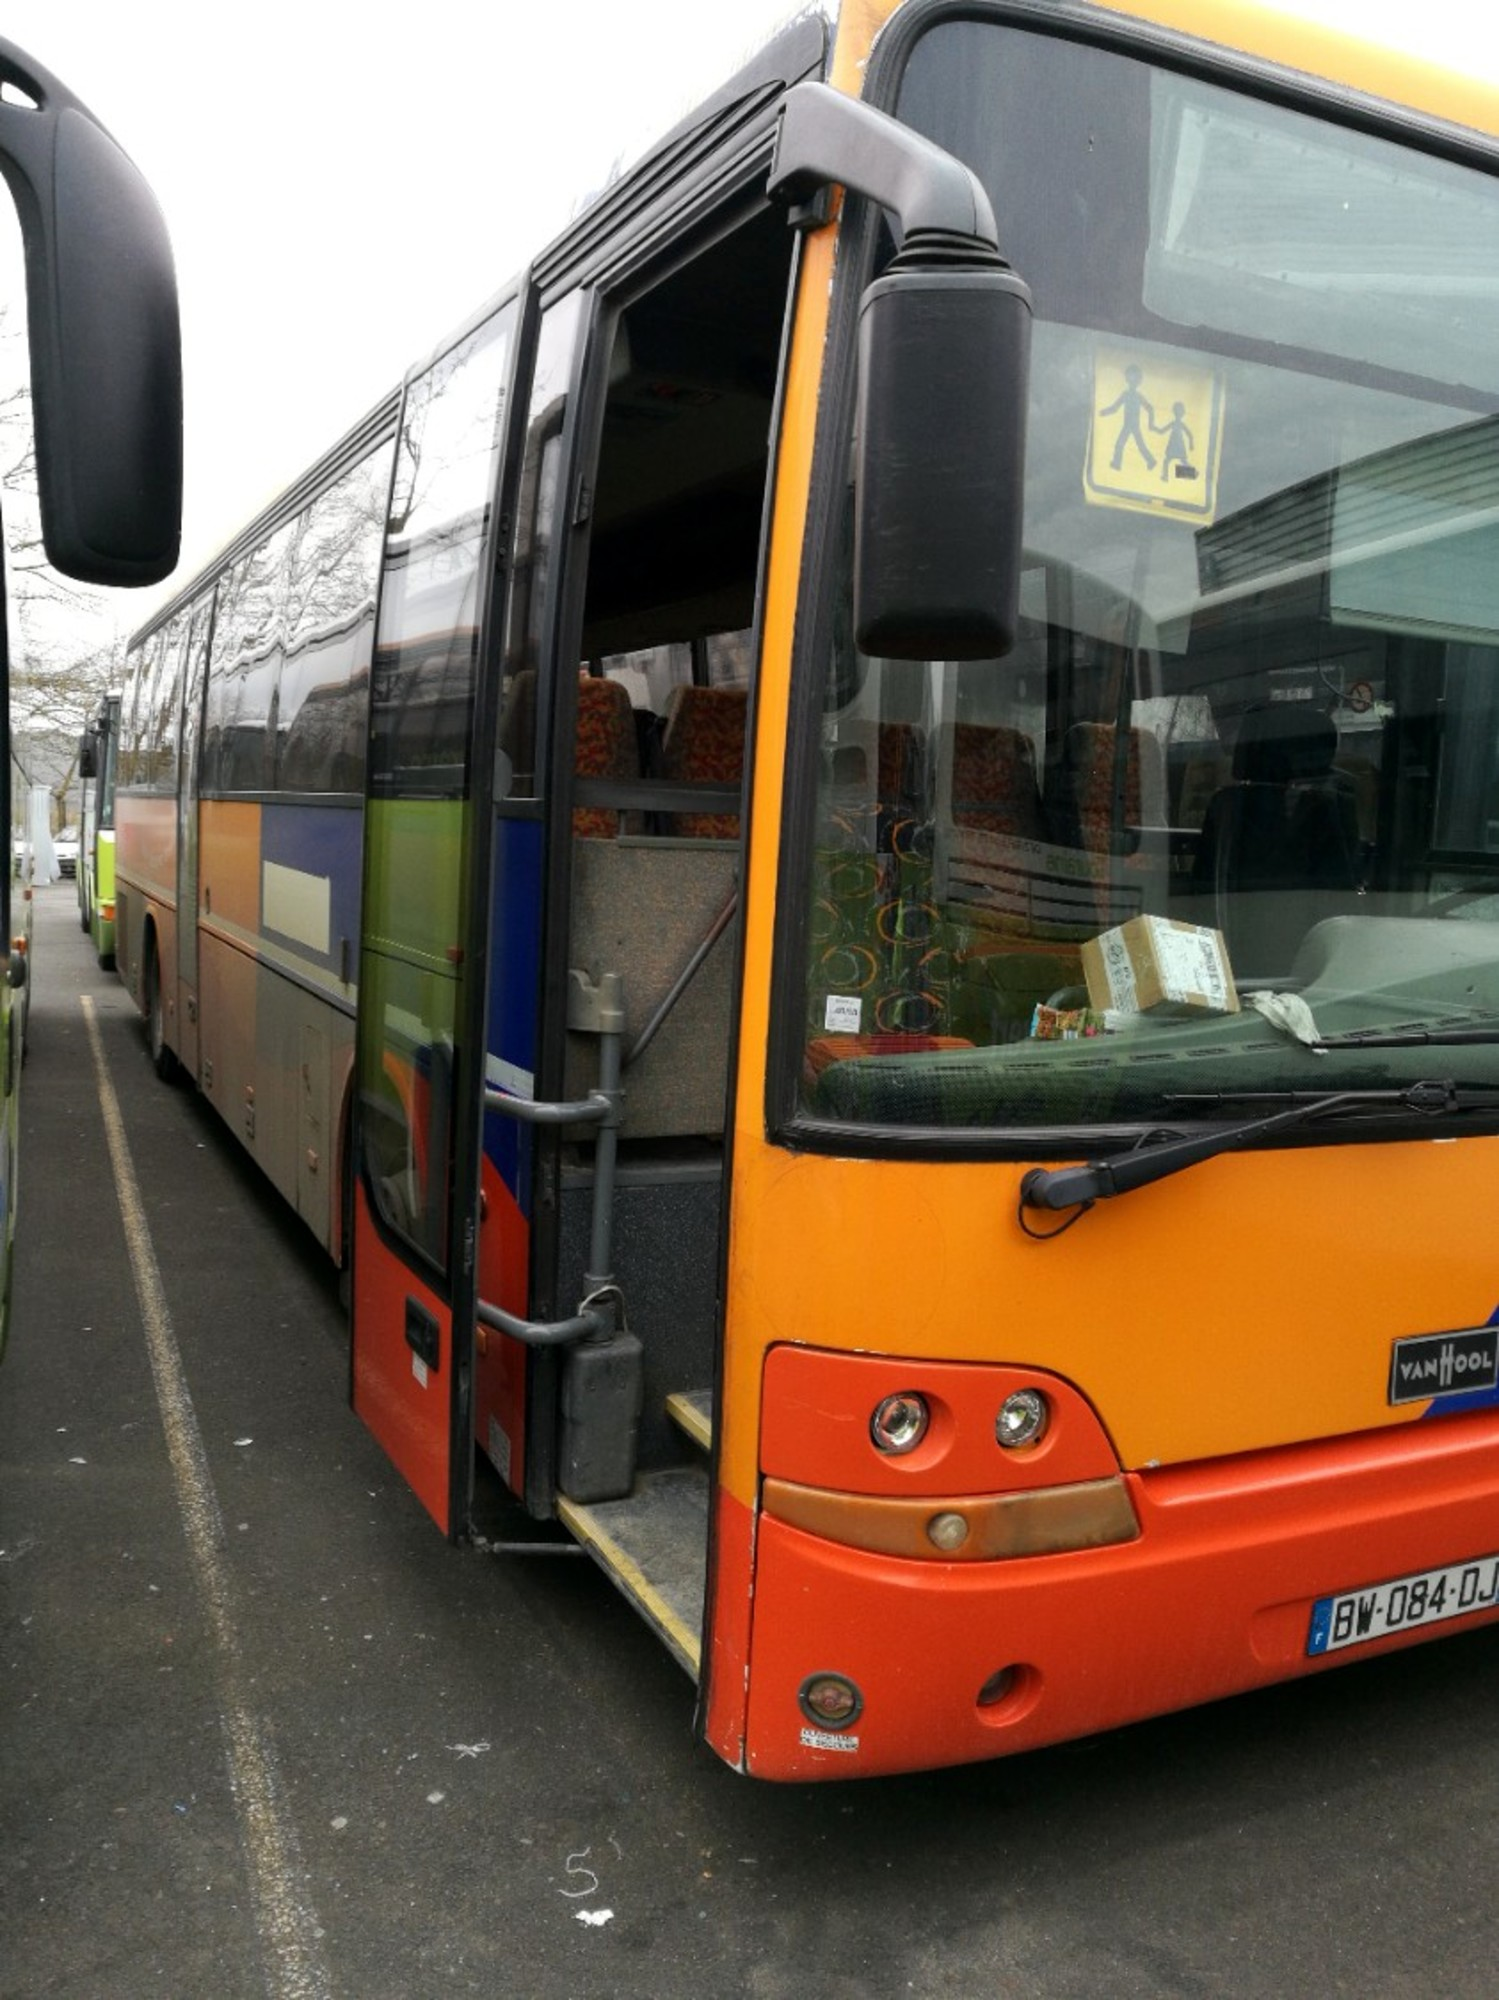 vanhool 915sc2 11177 car bus d 39 occasion aux ench res agorastore. Black Bedroom Furniture Sets. Home Design Ideas